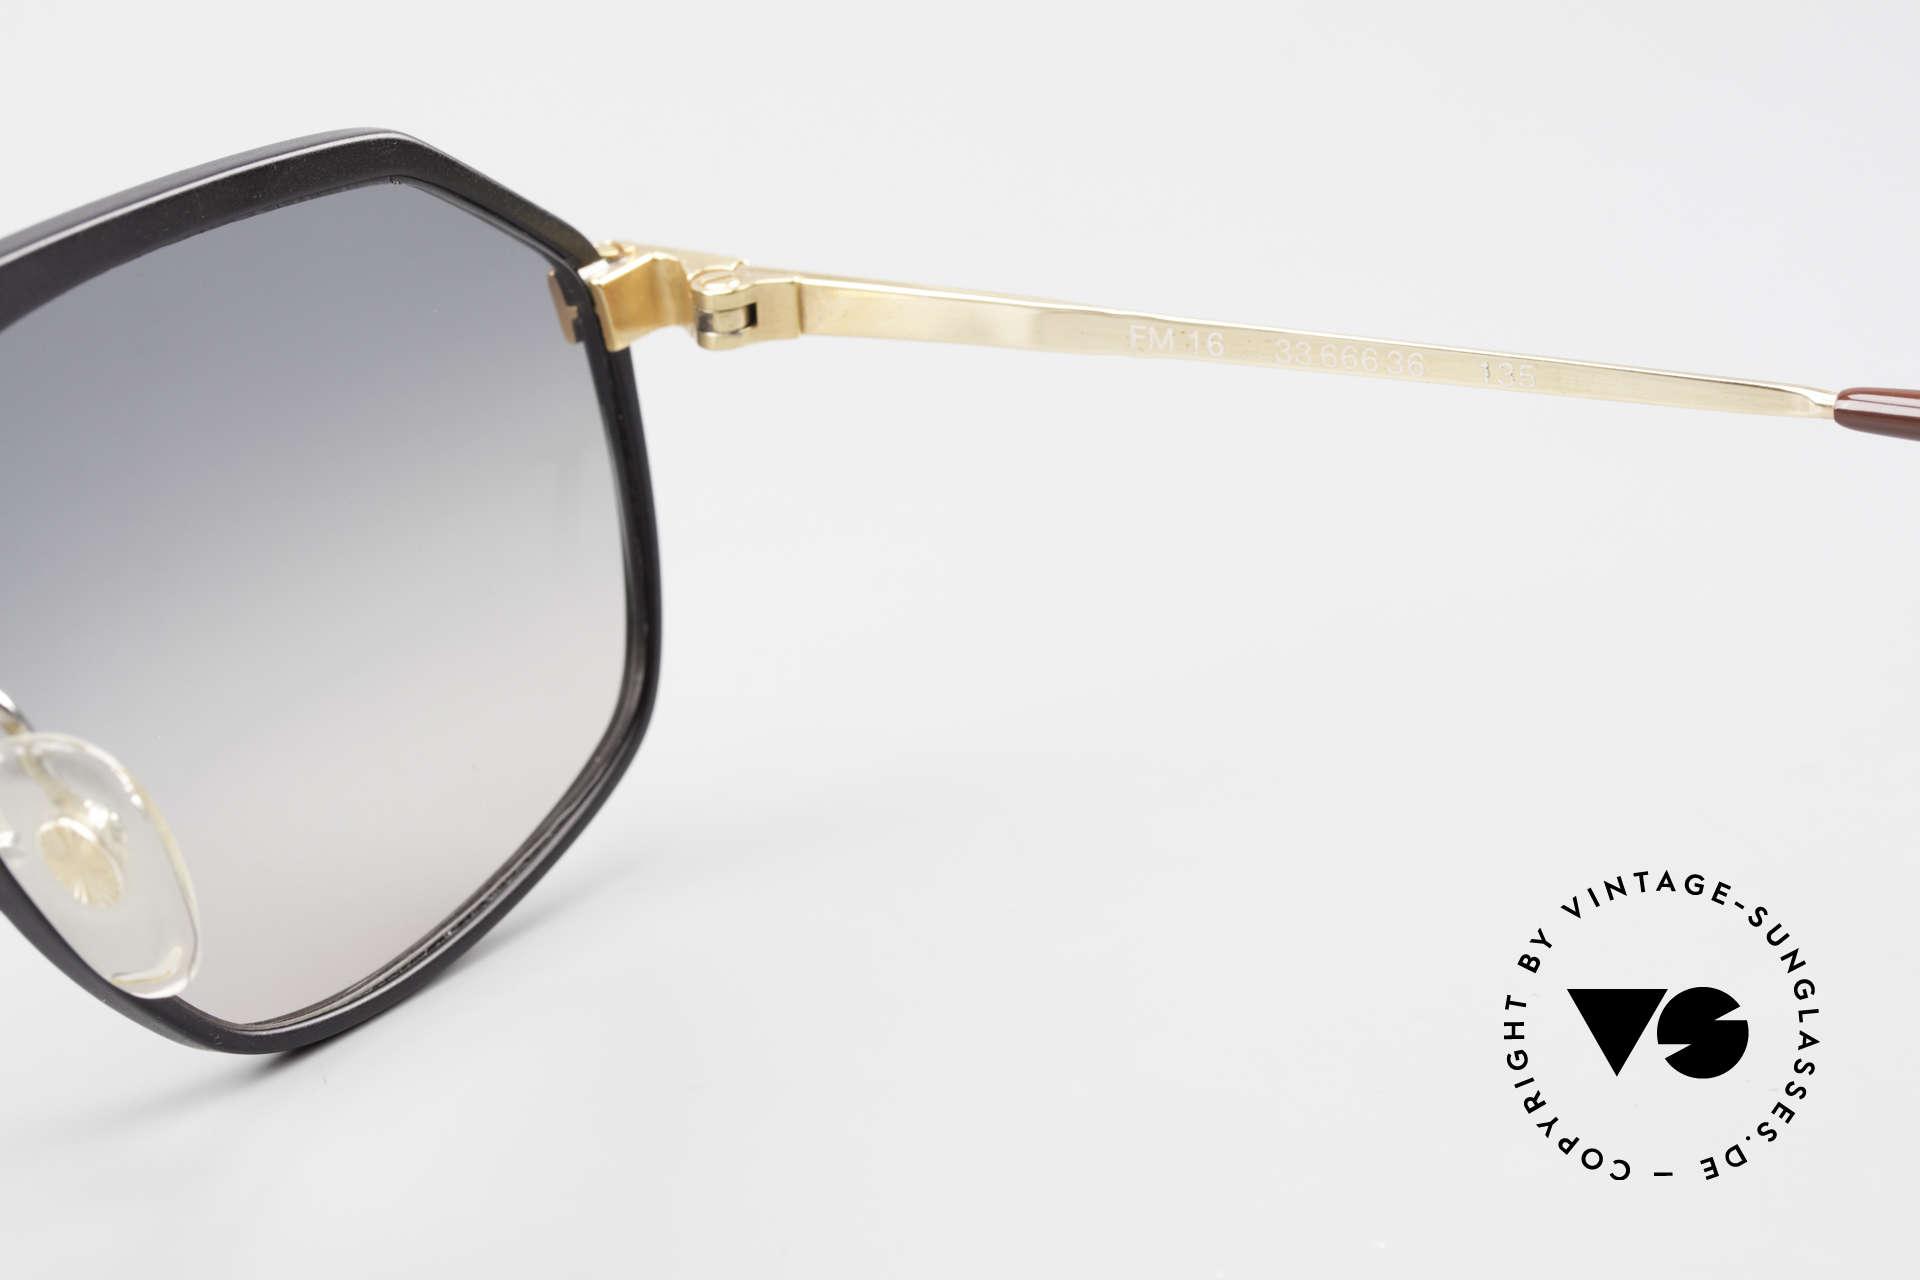 Alpina M6 True Vintage 80's Sunglasses, Size: medium, Made for Men and Women